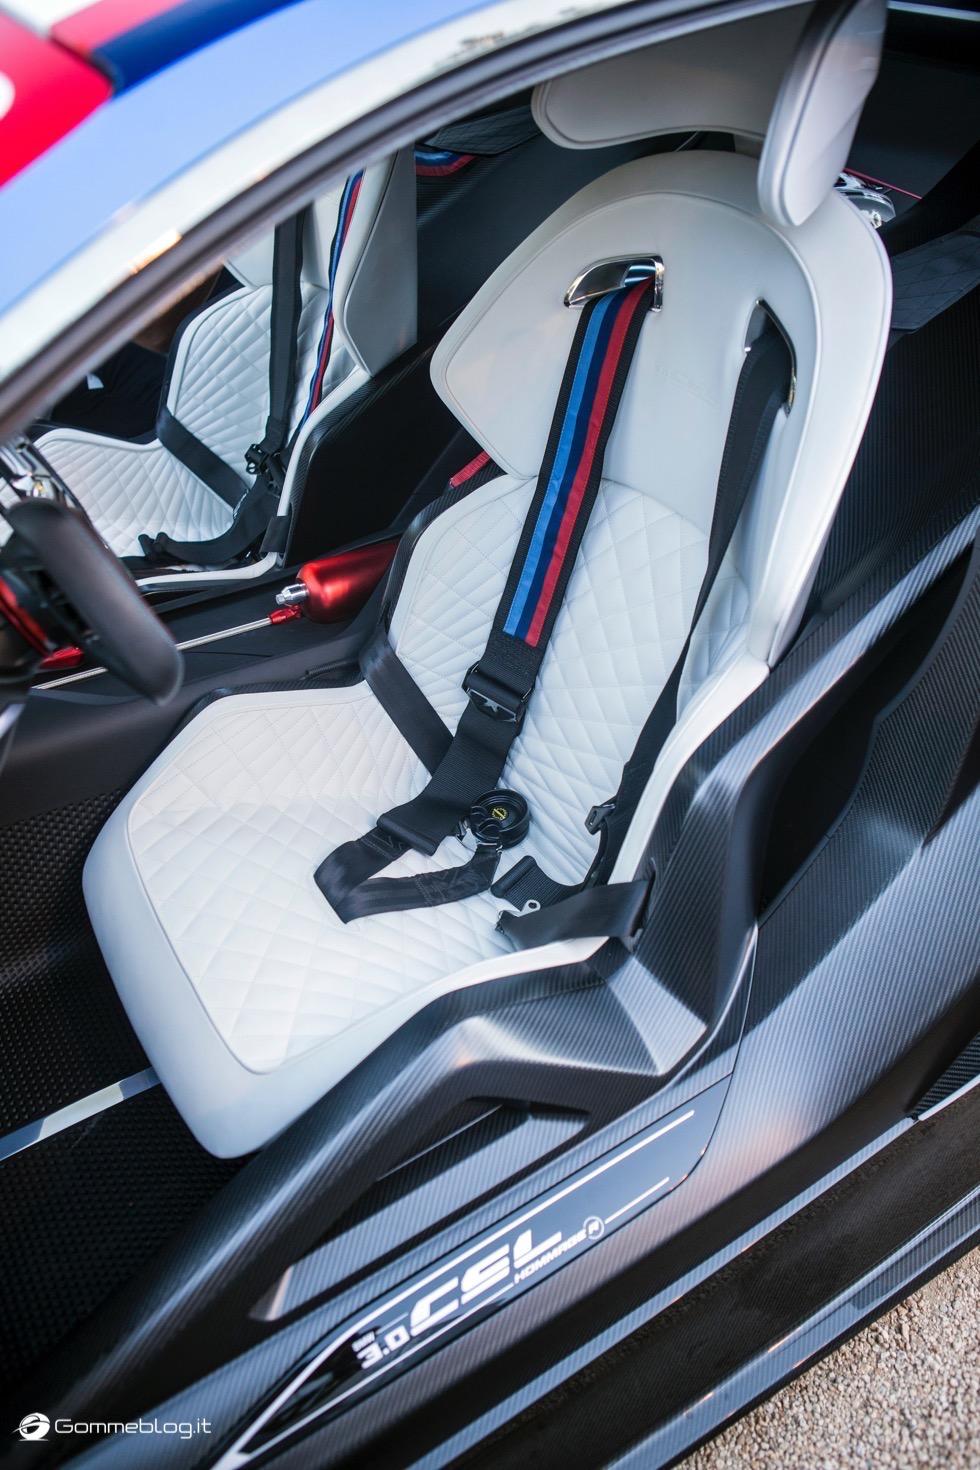 BMW 3.0 CSL Hommage R - Concorso d'Eleganza di Pebble Beach 2015 68